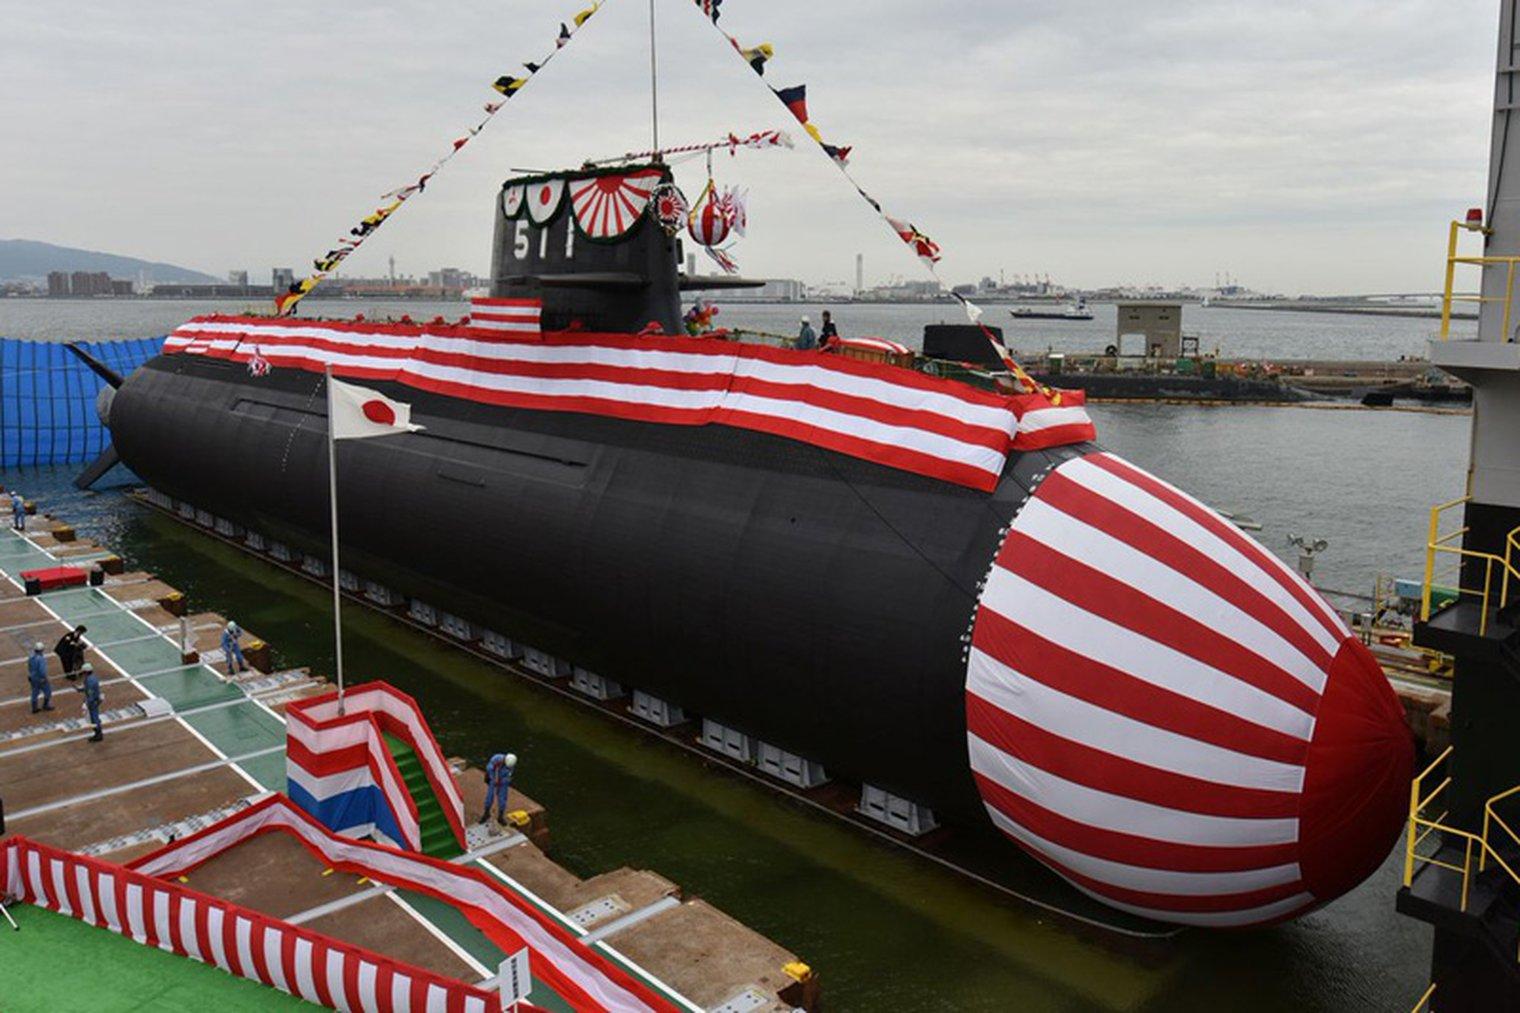 Japan launches first Li-ion submarine - NWI - Naval Warfare